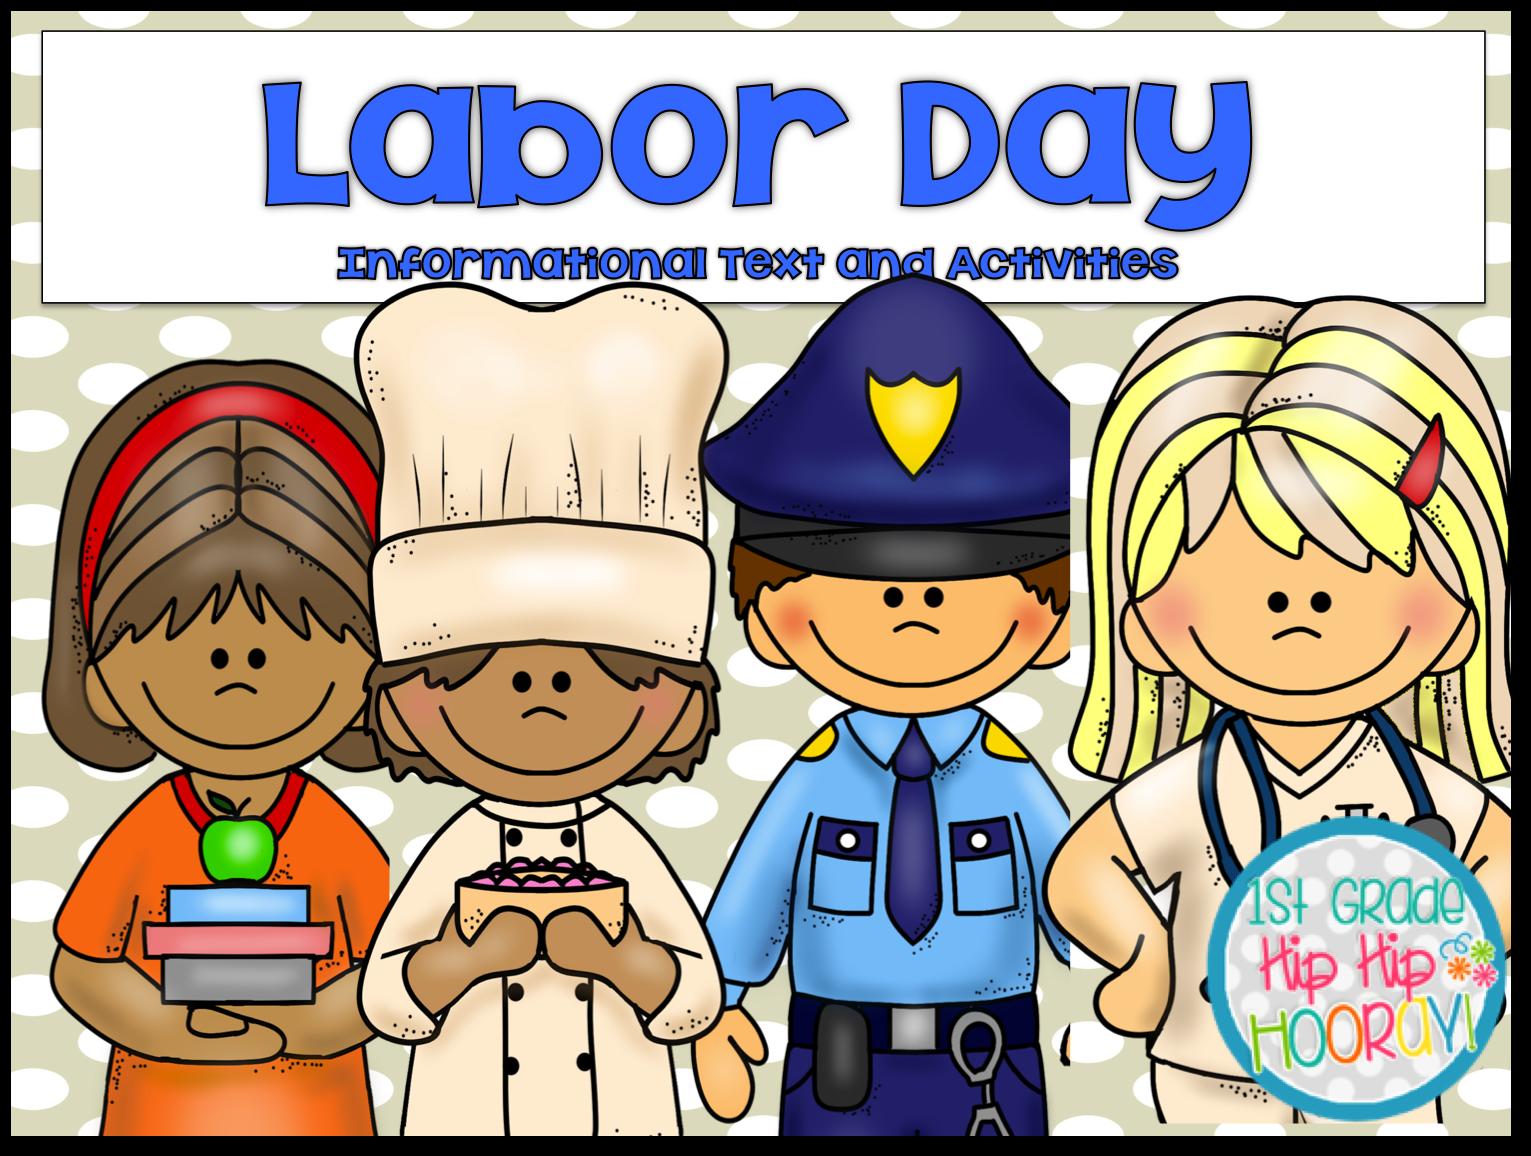 1st Grade Hip Hip Hooray!: Labor Day! #morethanathreedayweekend [ 1156 x 1531 Pixel ]